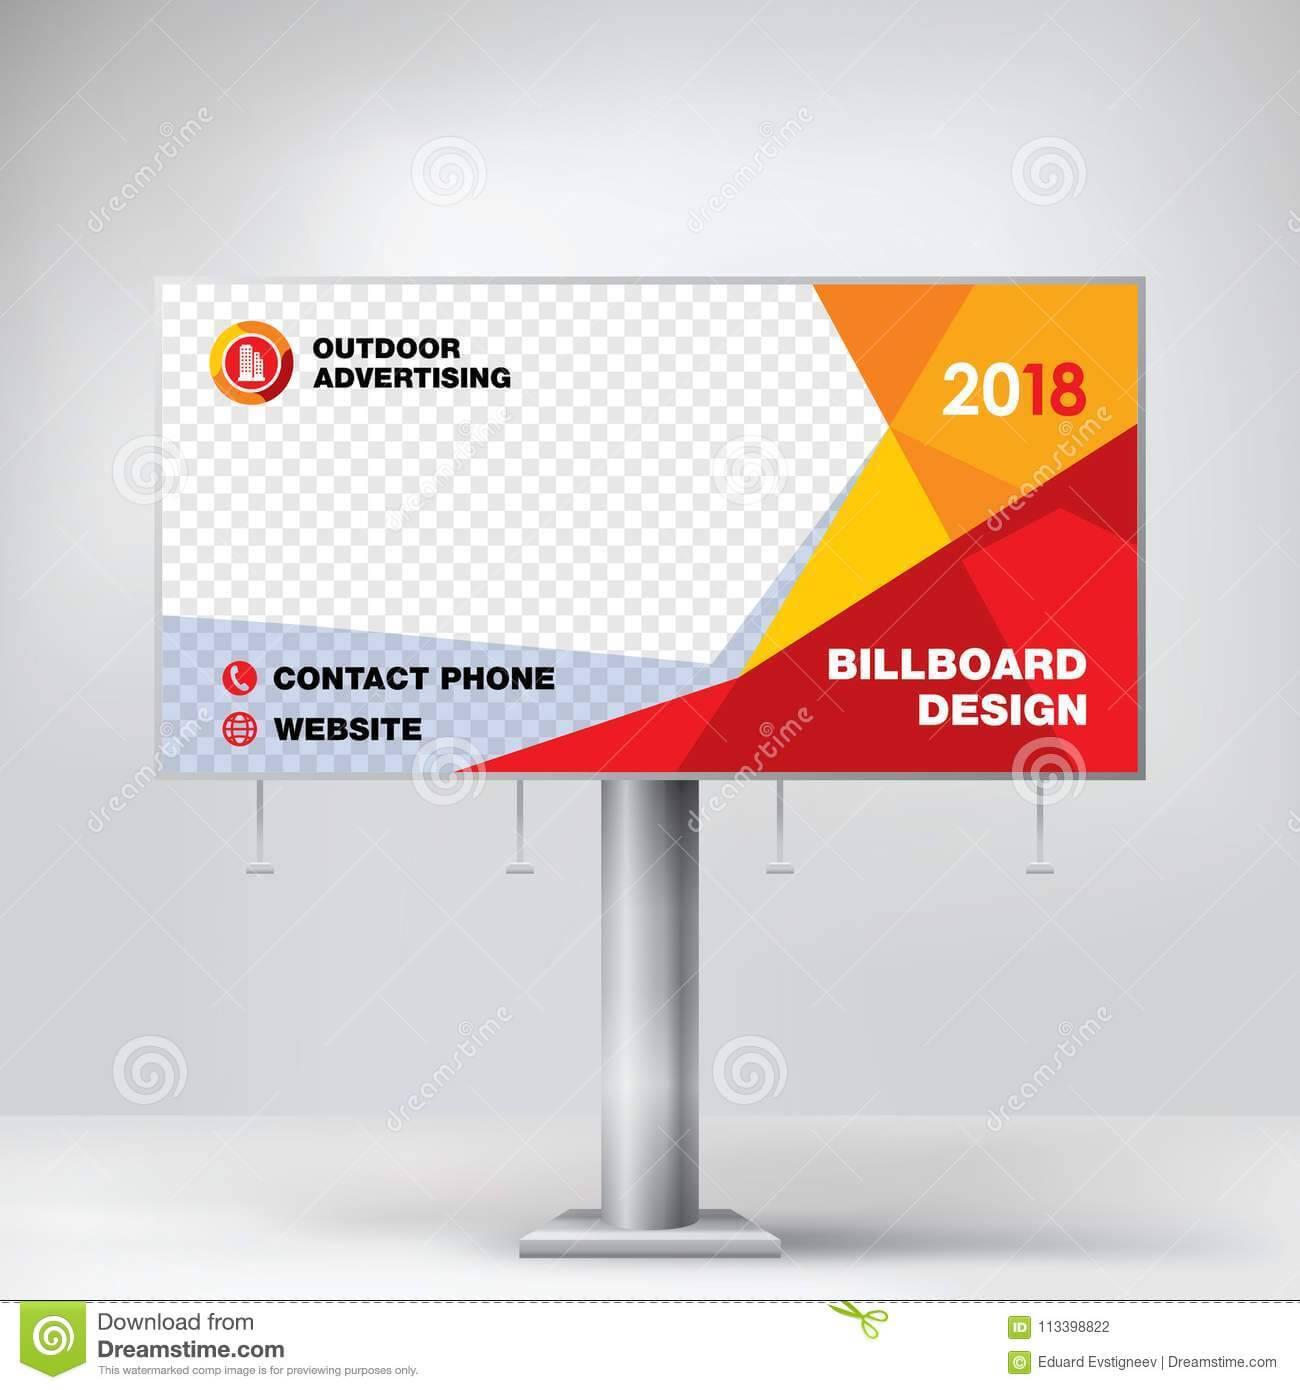 Outdoor Banner Design Templates - Atlantaauctionco For Outdoor Banner Design Templates